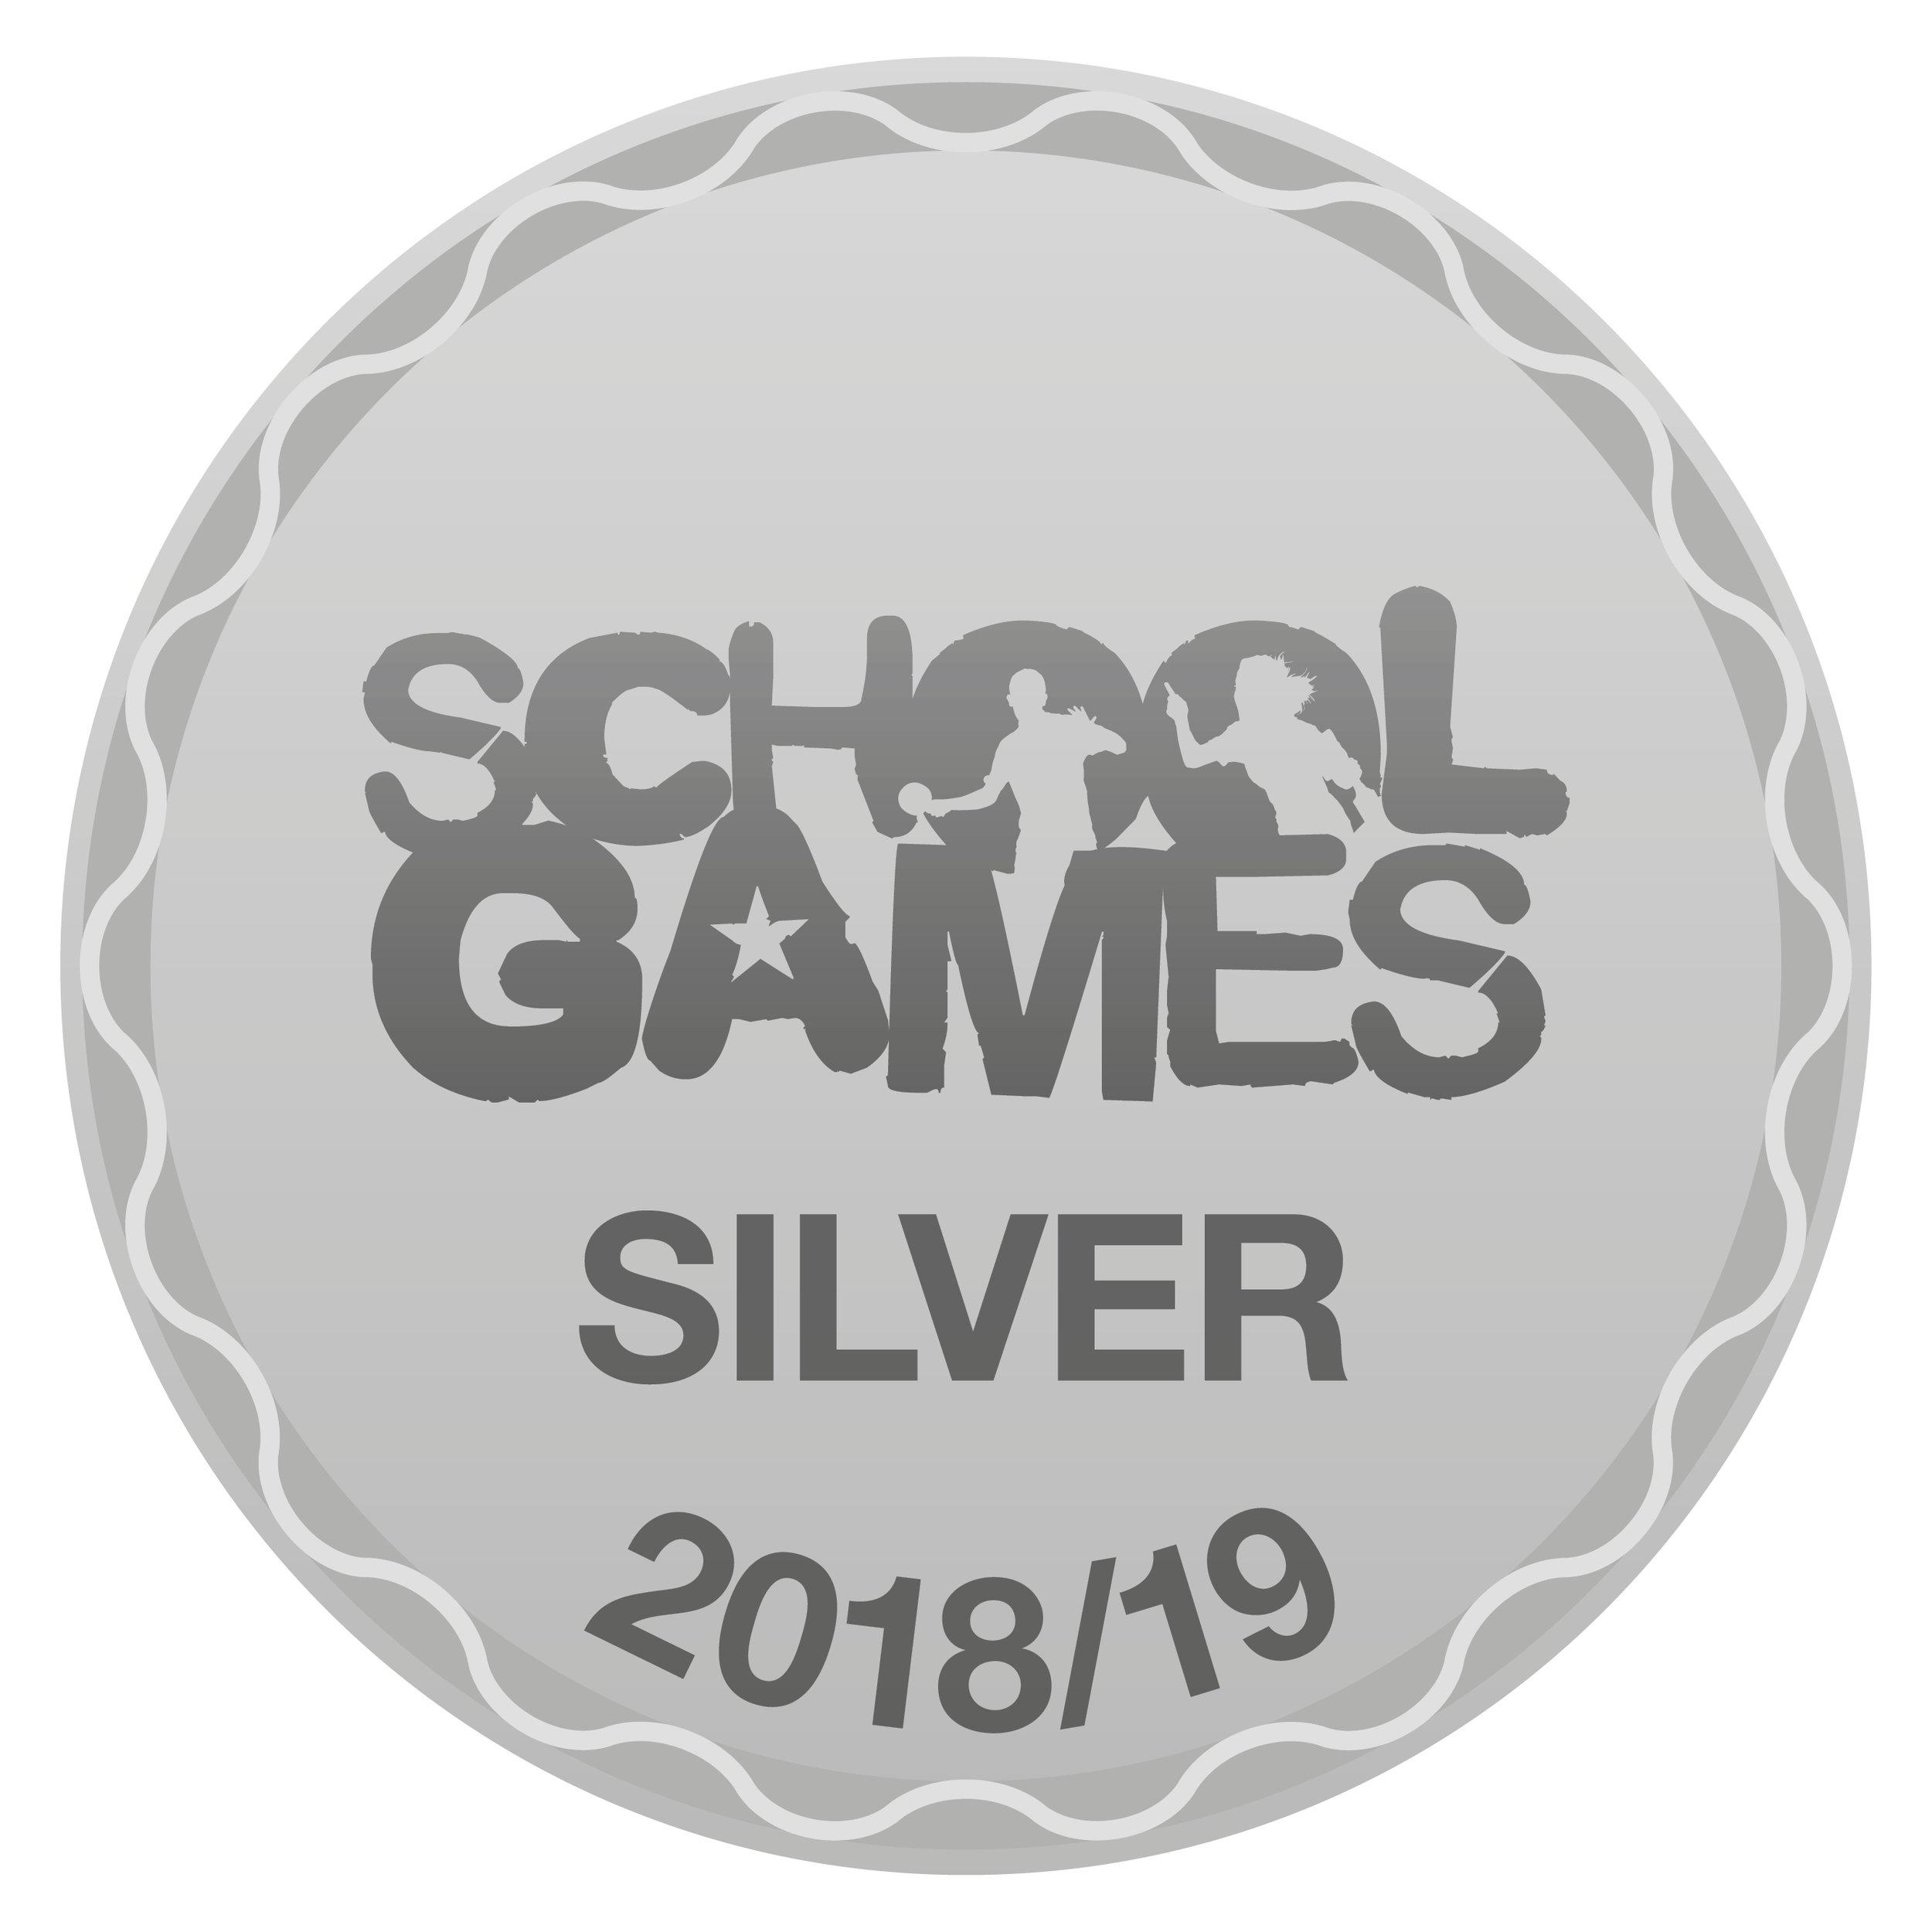 SG-L1-3-mark-silver-2018-19.jpg